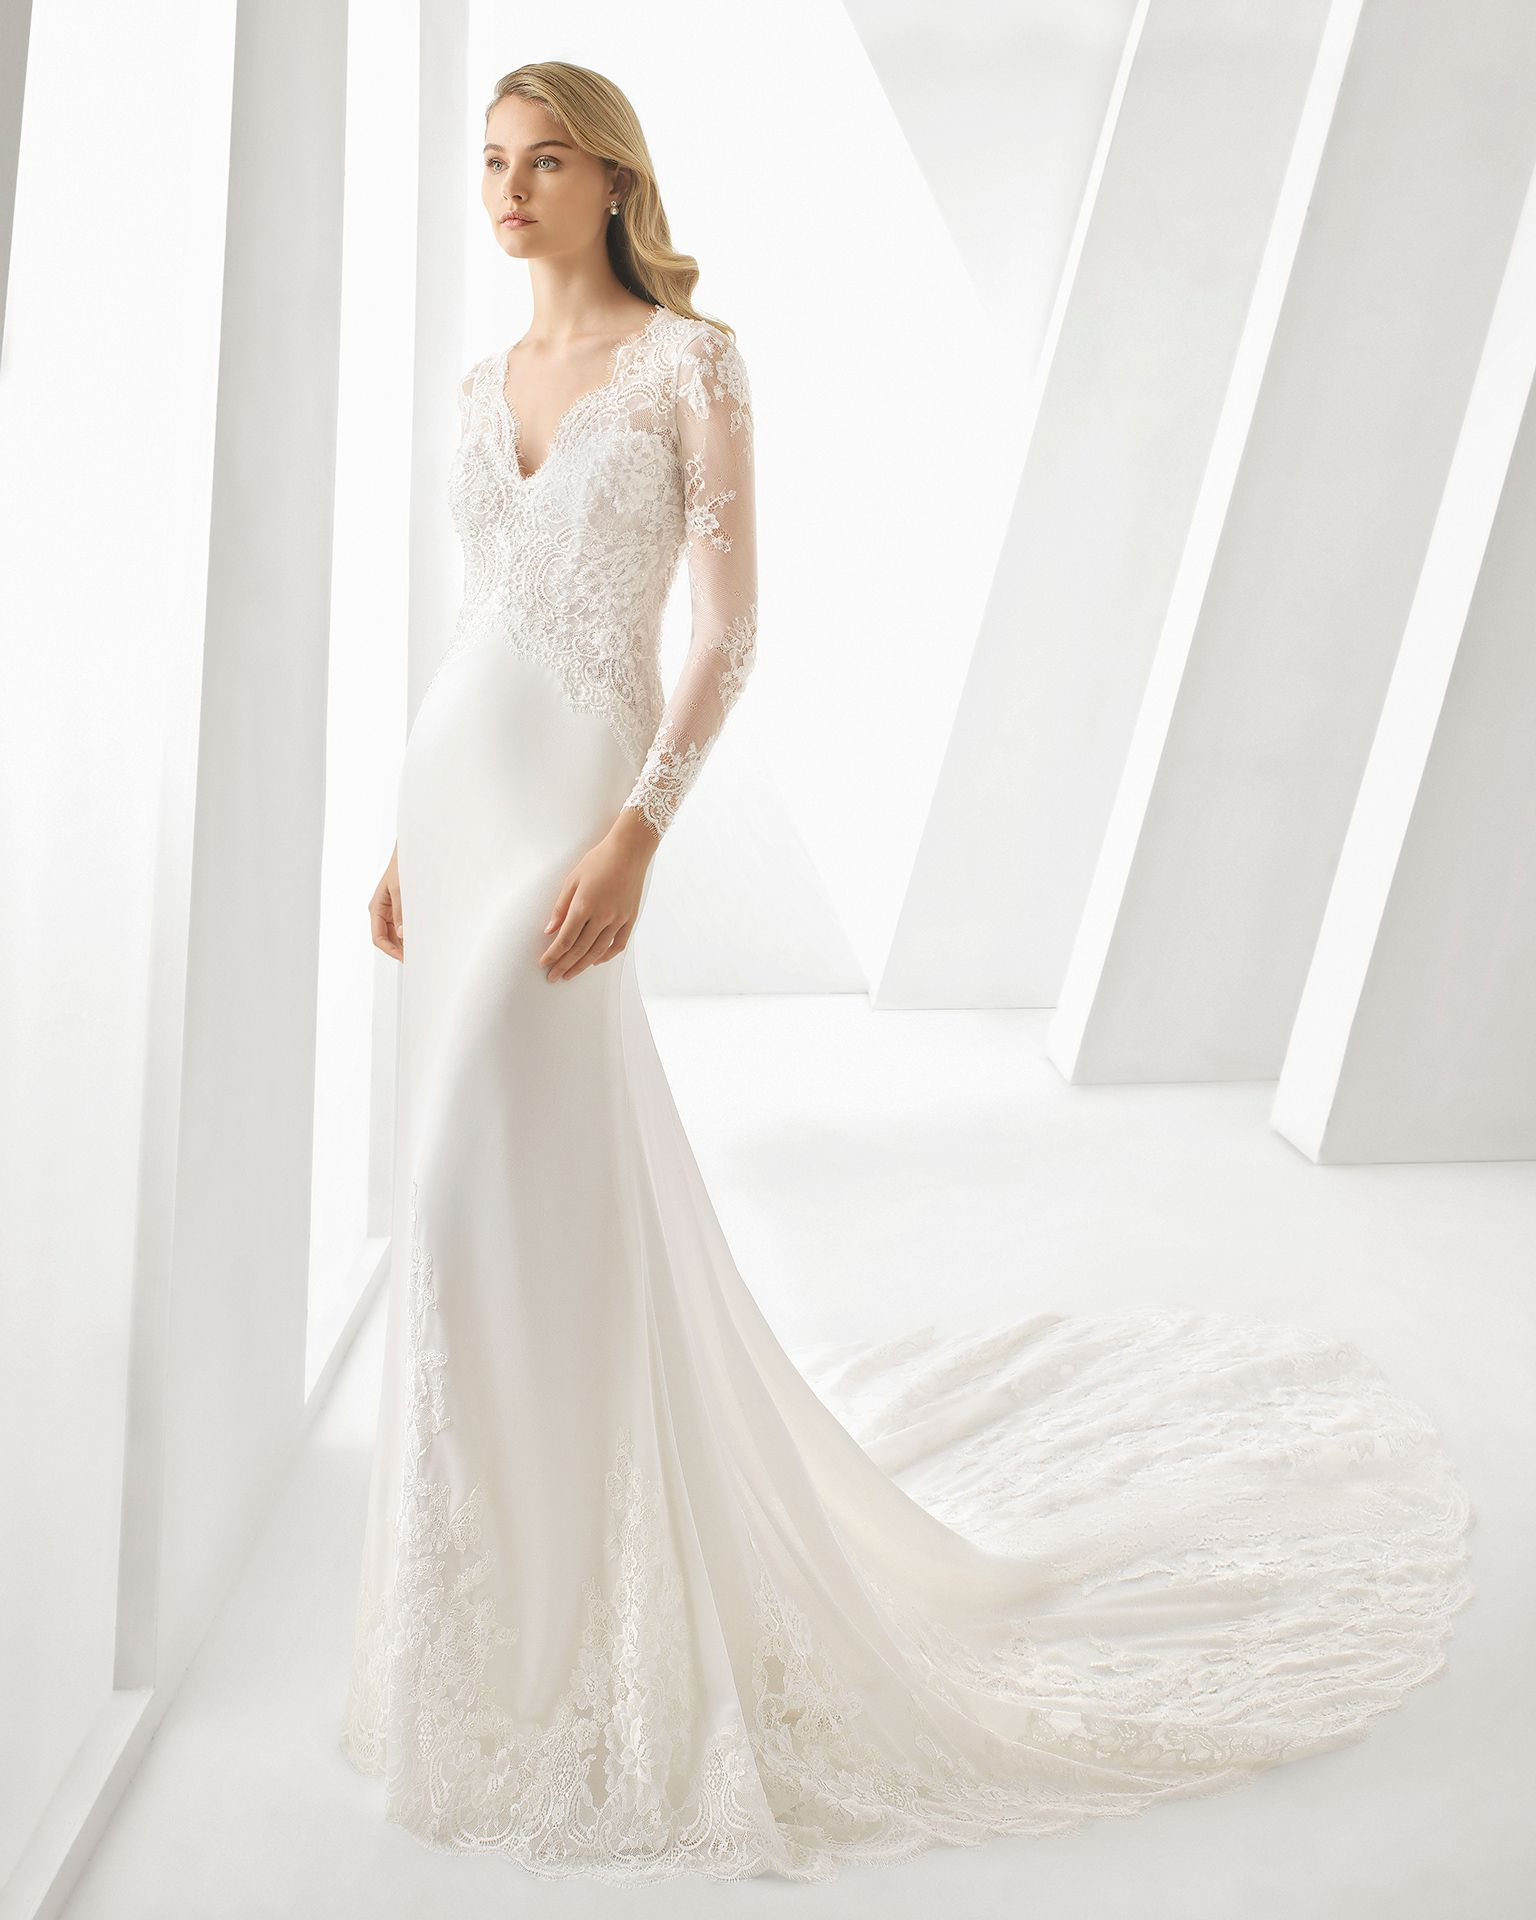 Daby Wedding Dress Long Sleeve Rosa Clara Wedding Dresses Wedding Dresses [ 1920 x 1536 Pixel ]